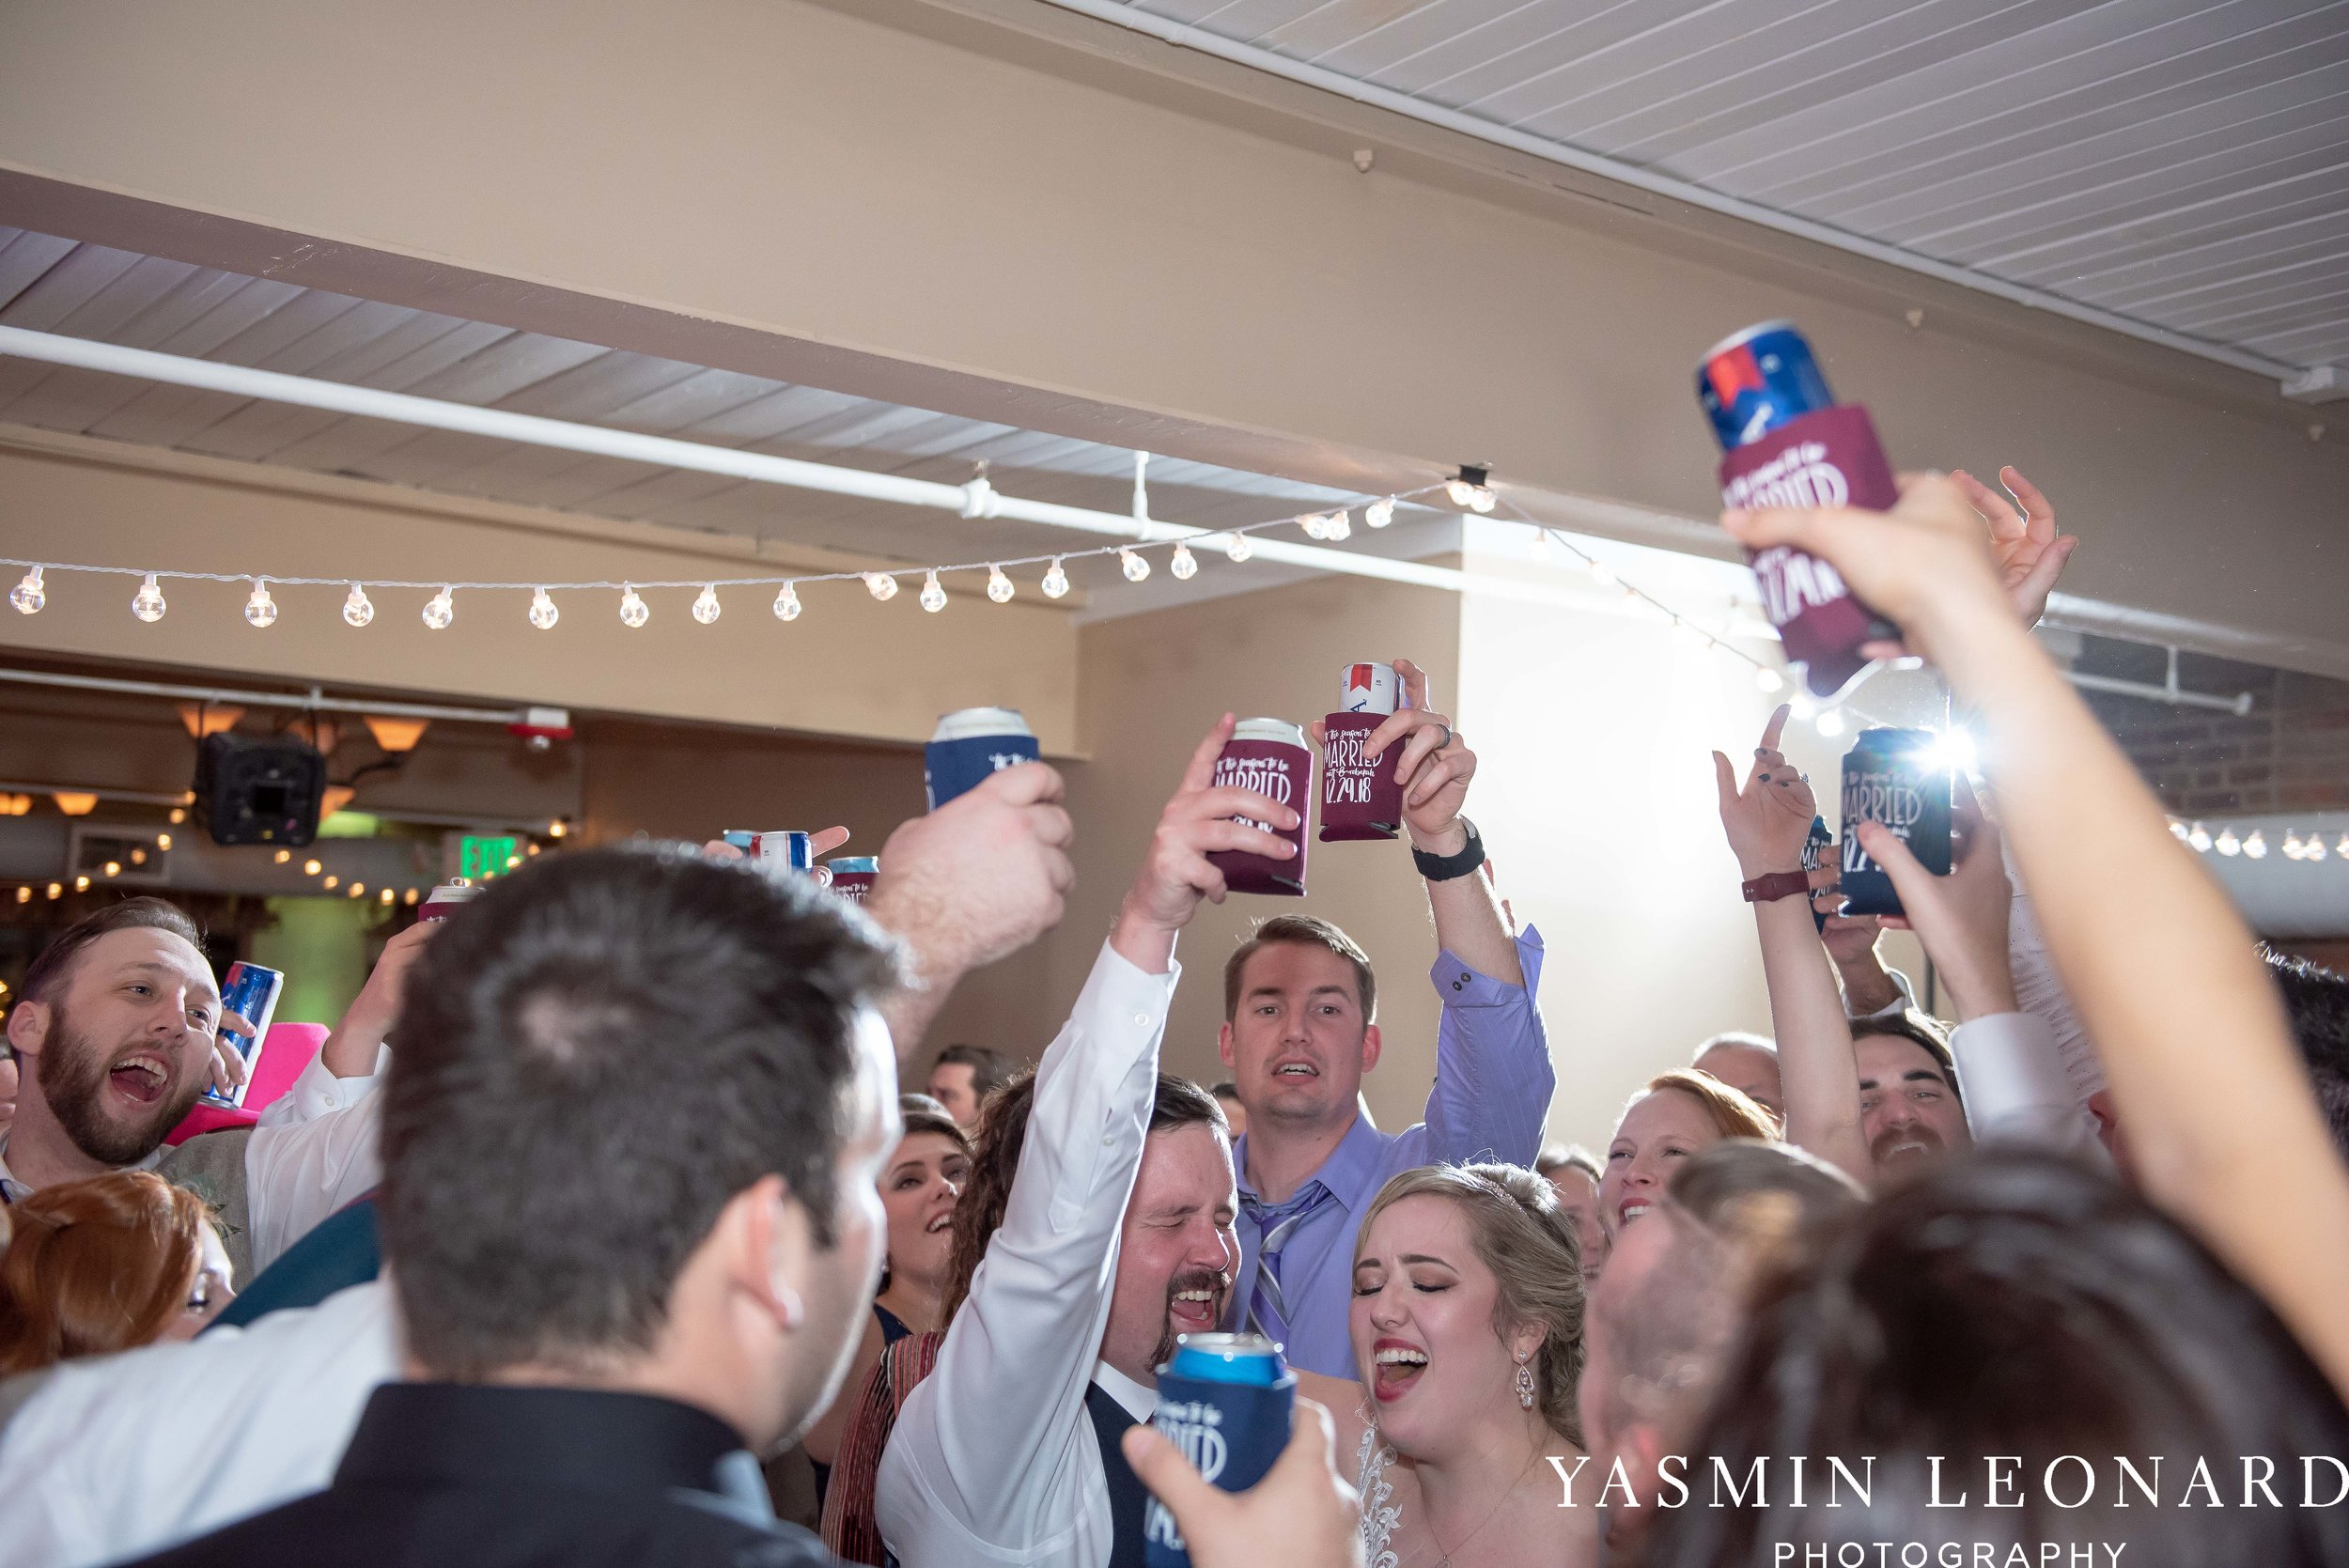 Rebekah and Matt - 105 Worth Event Centre - Yasmin Leonard Photography - Asheboro Wedding - NC Wedding - High Point Weddings - Triad Weddings - Winter Wedding-78.jpg